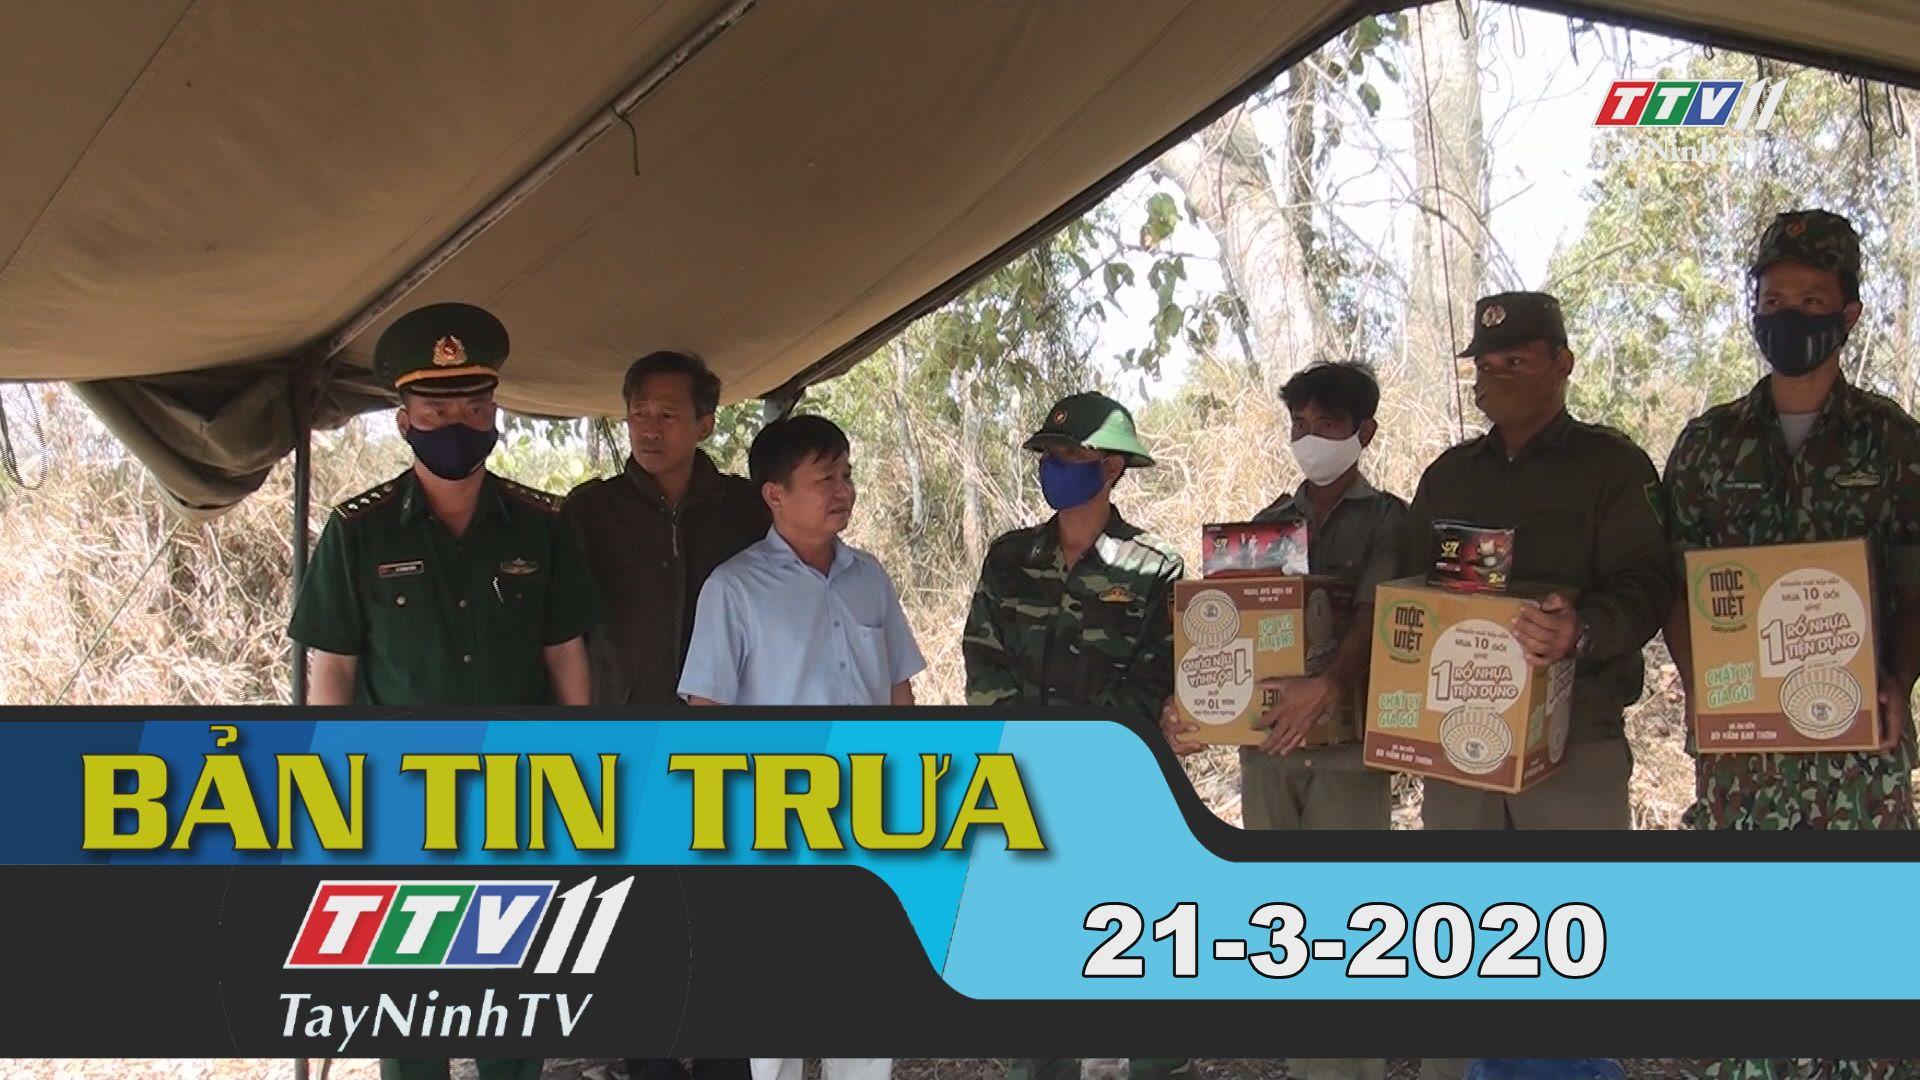 Bản tin trưa 21-3-2020 | Tin tức hôm nay | TayNinhTV